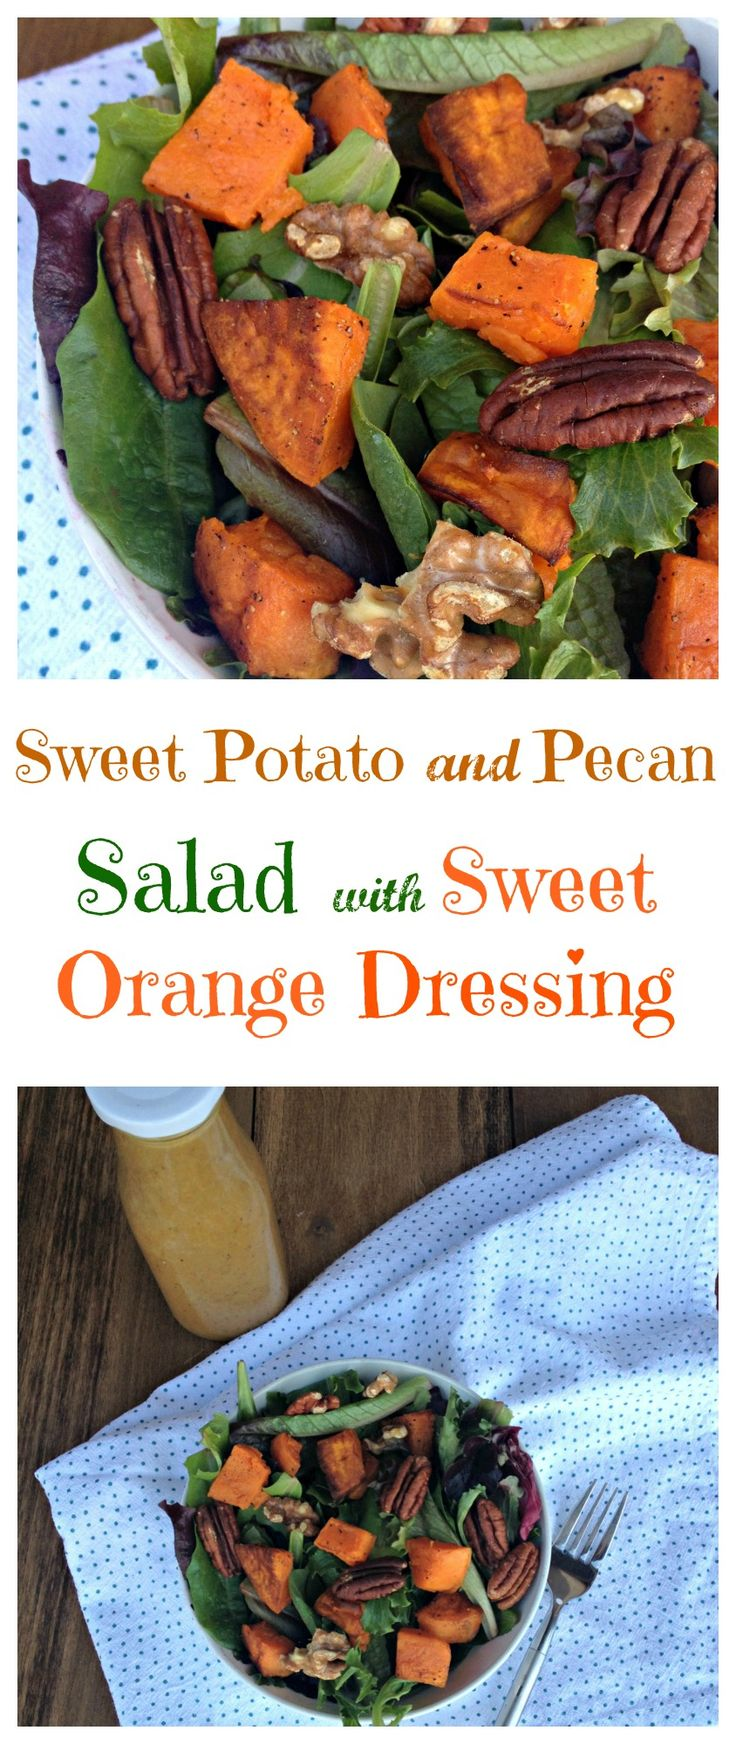 Roasted Sweet Potato and Pecan Salad with Sweet Orange Dressing ...